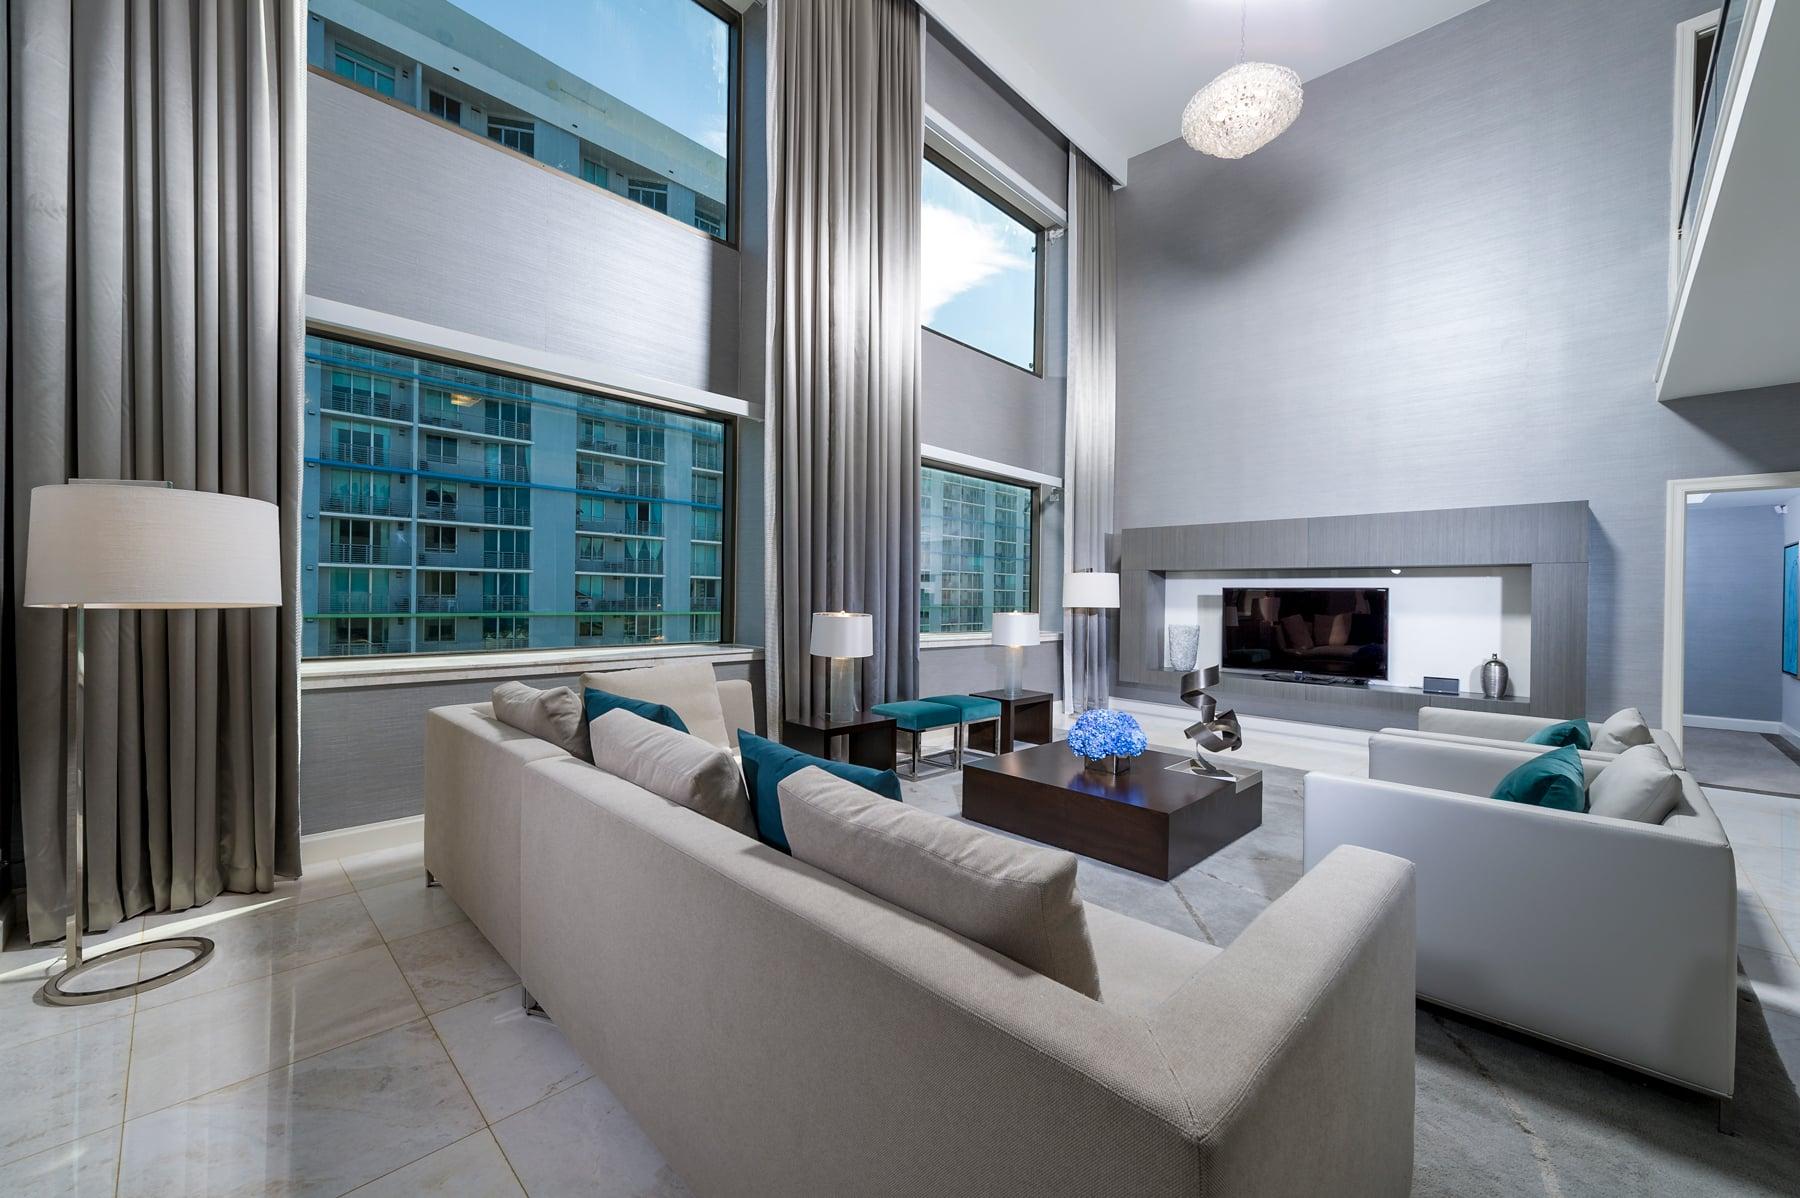 Intercontinental Hotel   Room 2   Miami, FL   Hospitality   Interior Designers